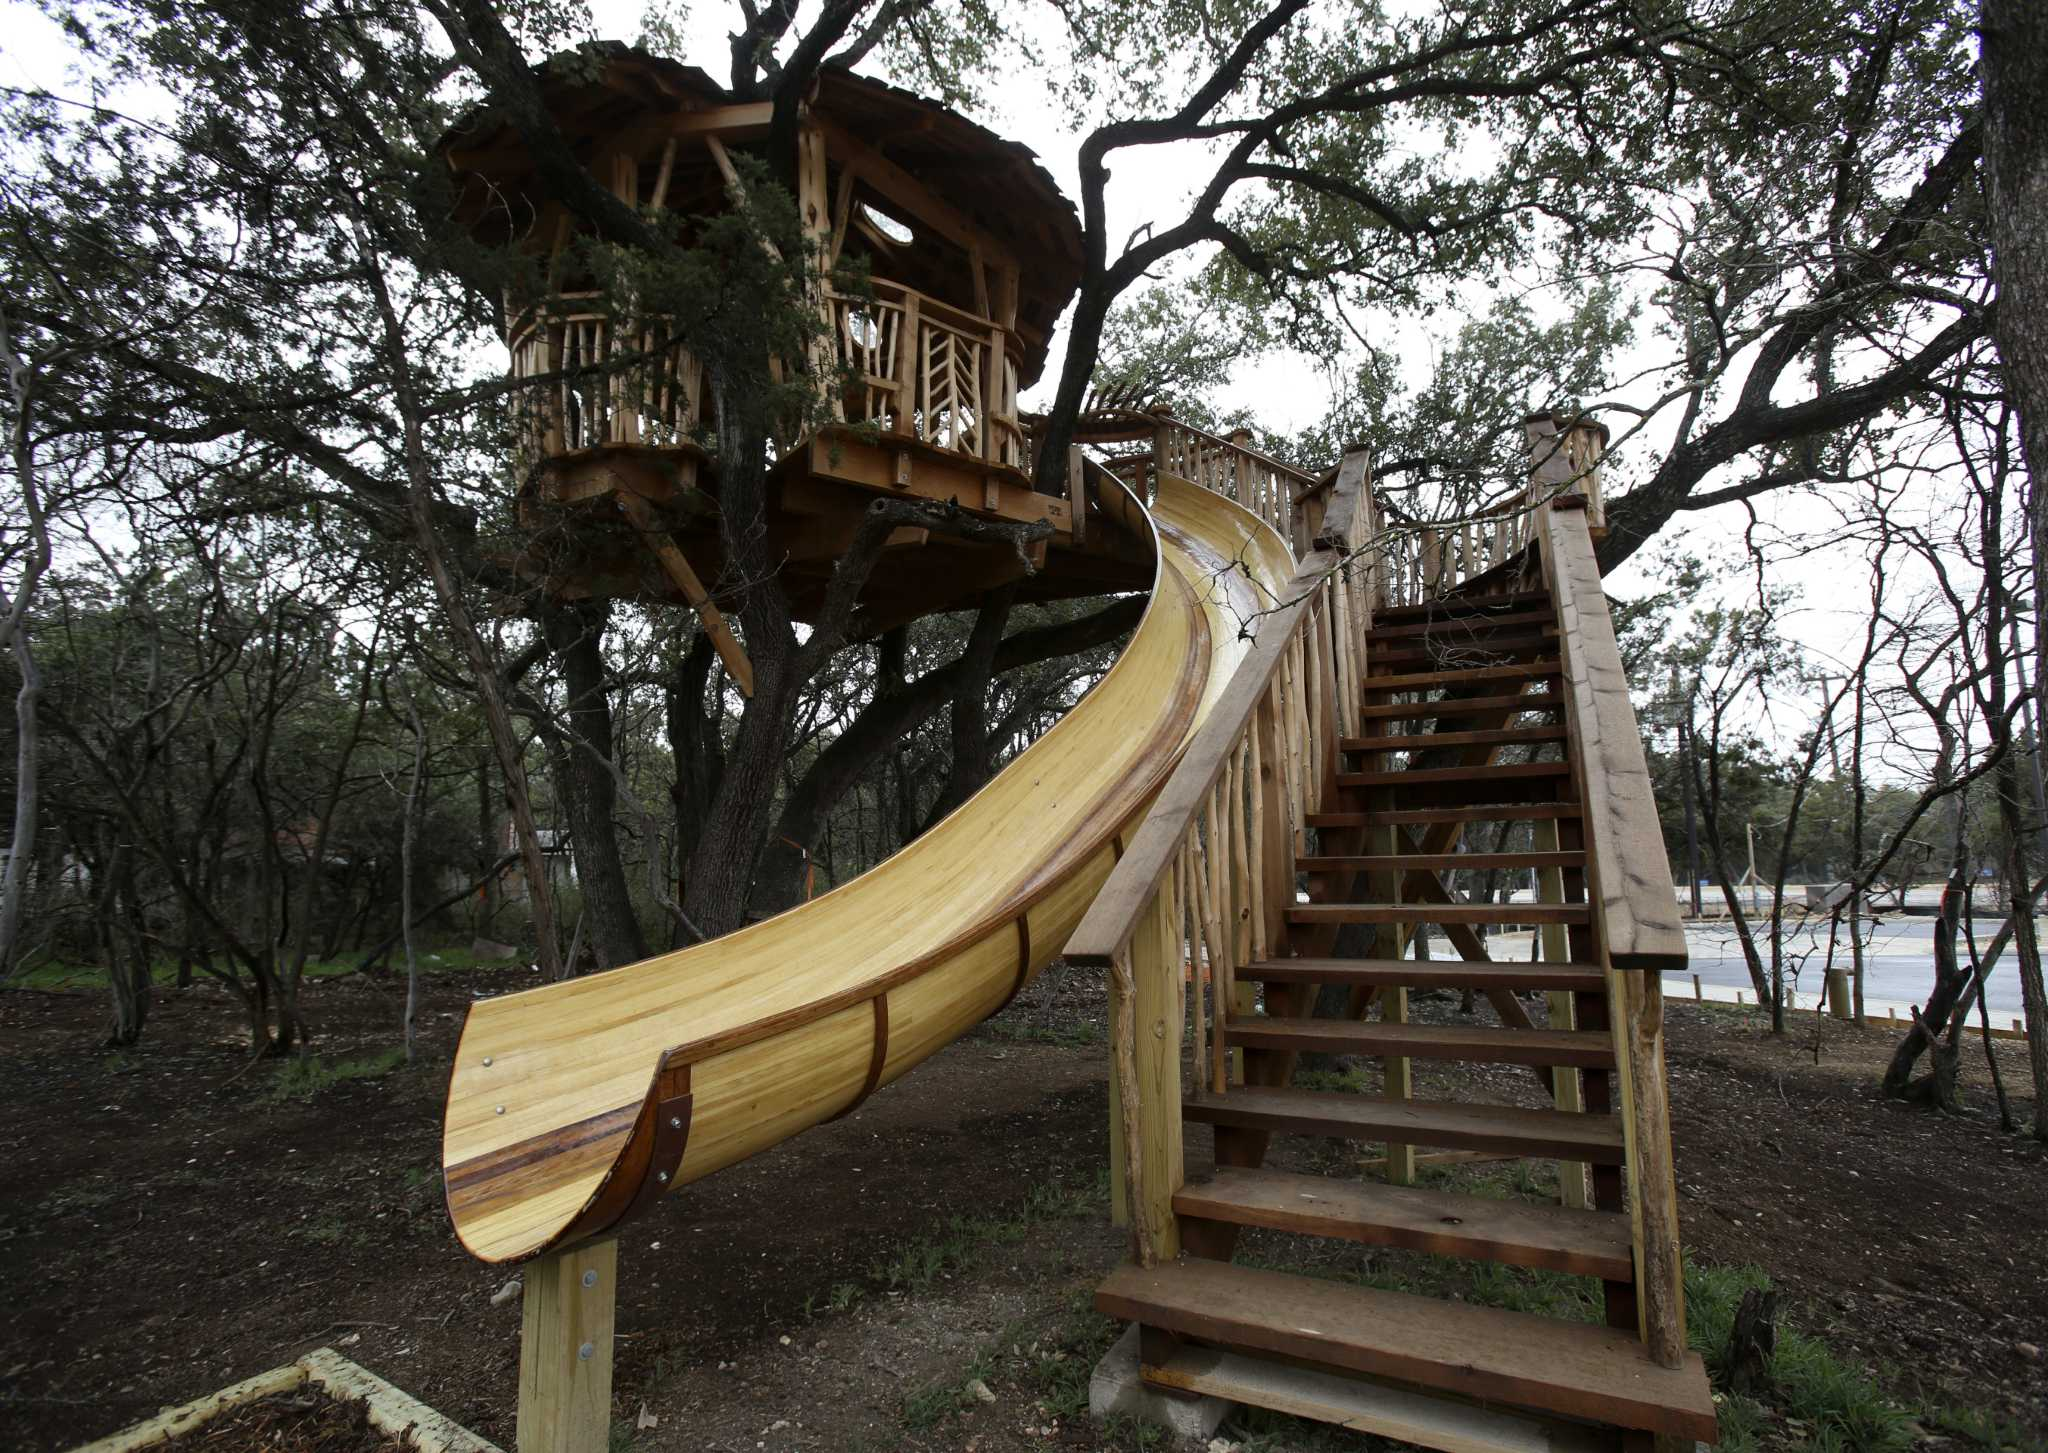 Treehouse Designs Reach New Heights San Antonio Express News